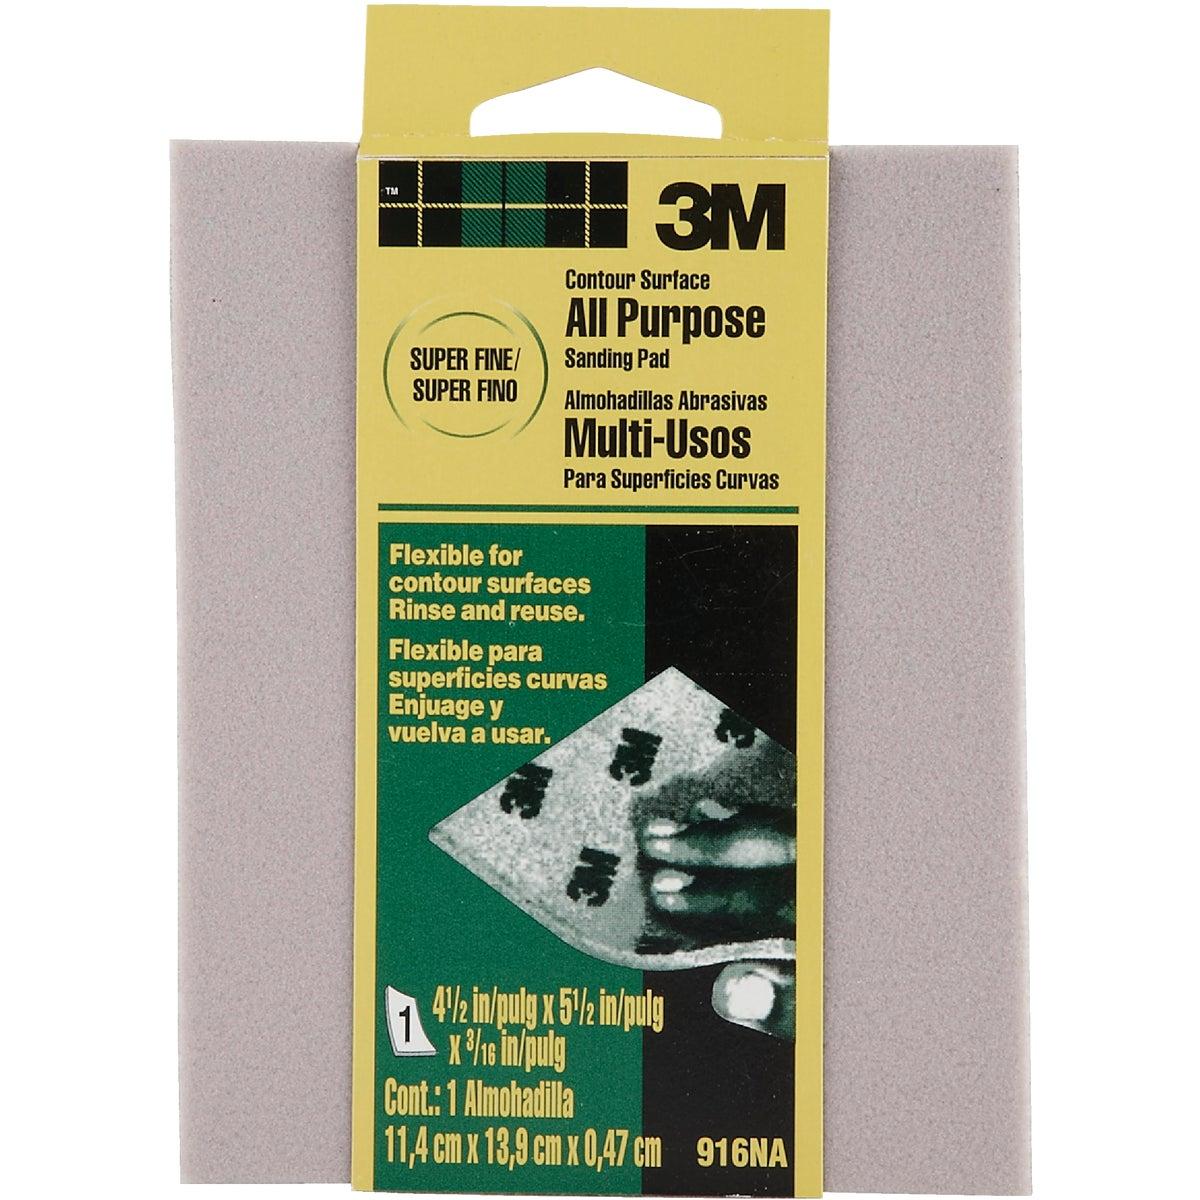 3M Contour Surface All-Purpose 4-1/2 In. x 5-1/2 In. x 3/16 In. Super Fine Sanding Sponge